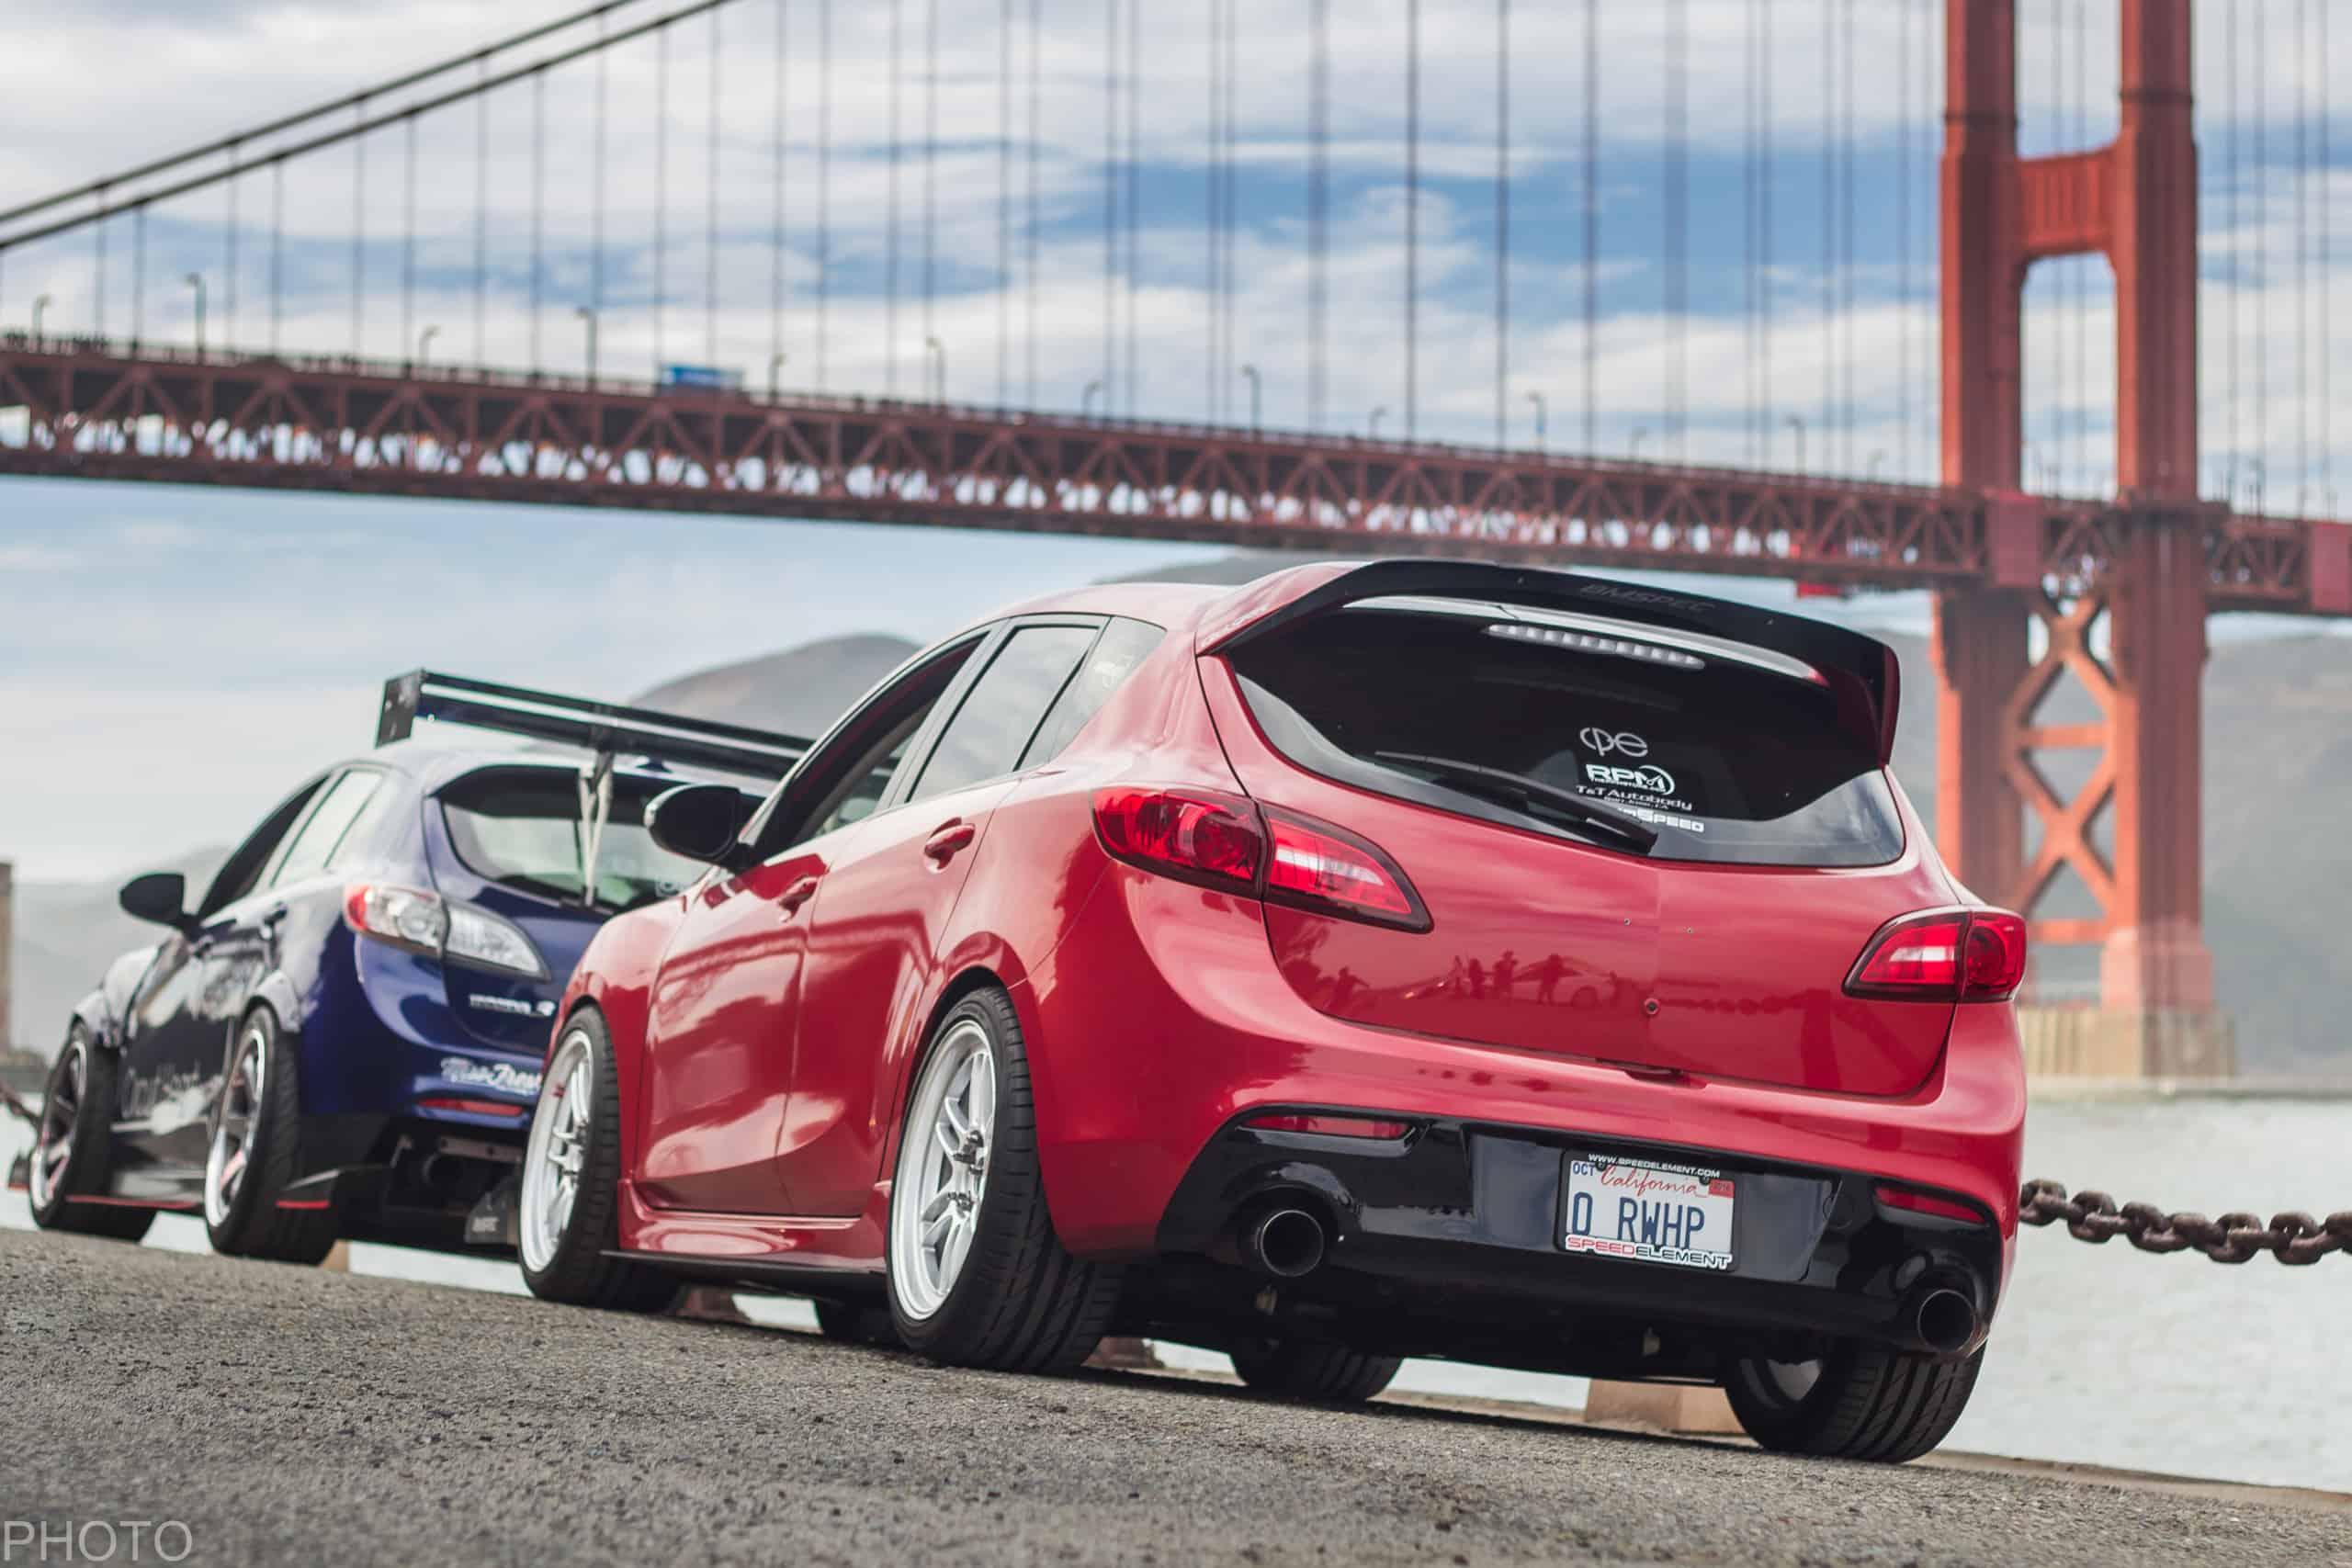 Mazdaspeed3 Build part 2